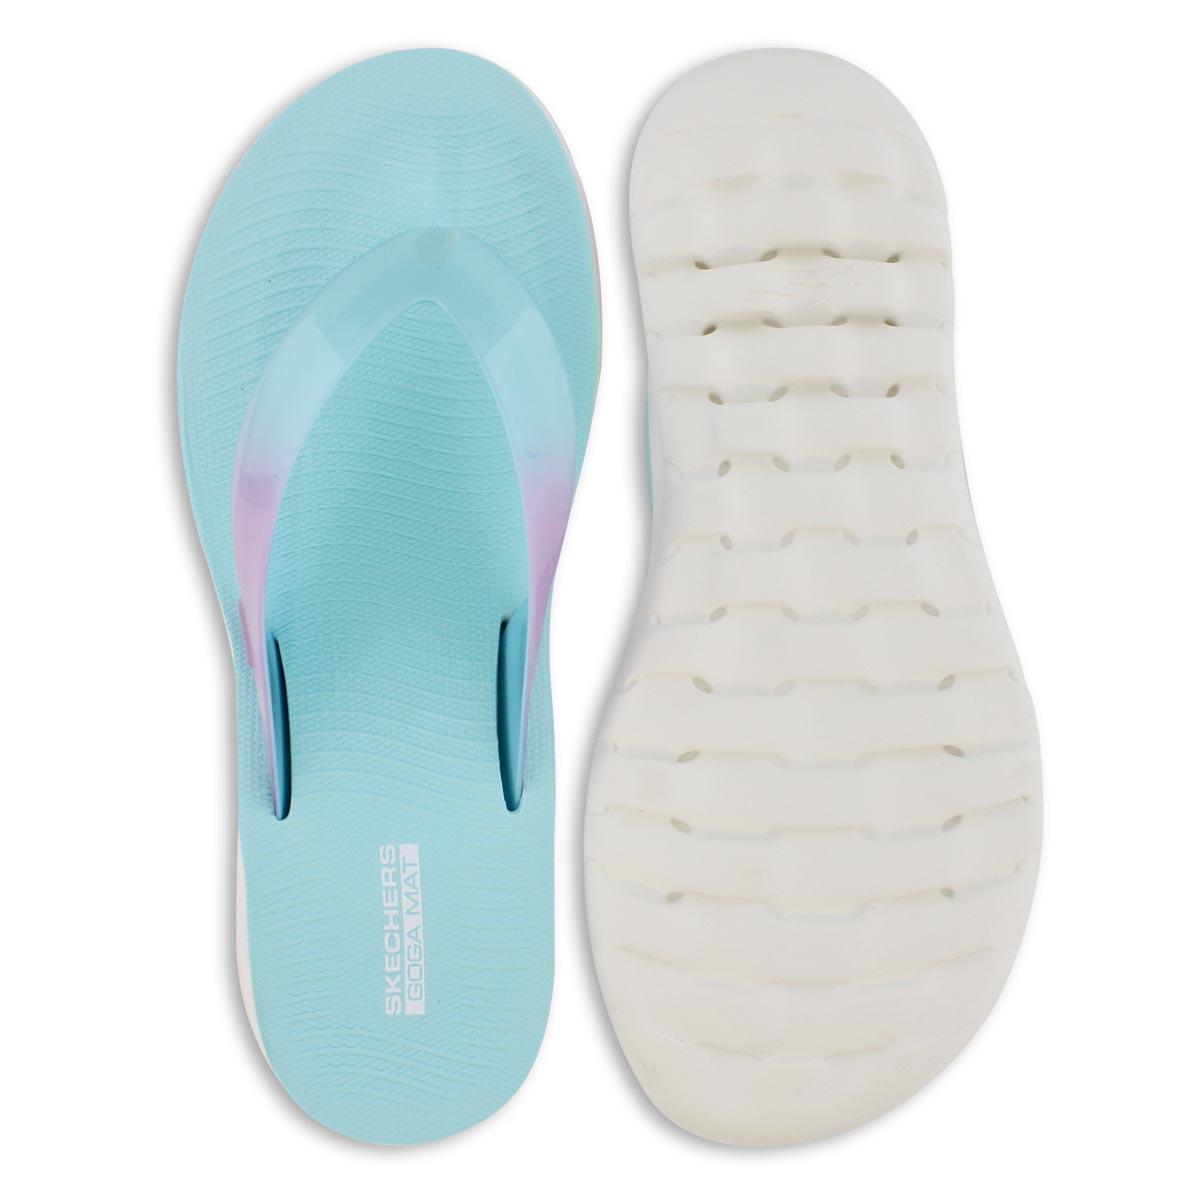 Lds TBA turq/pink flip flop